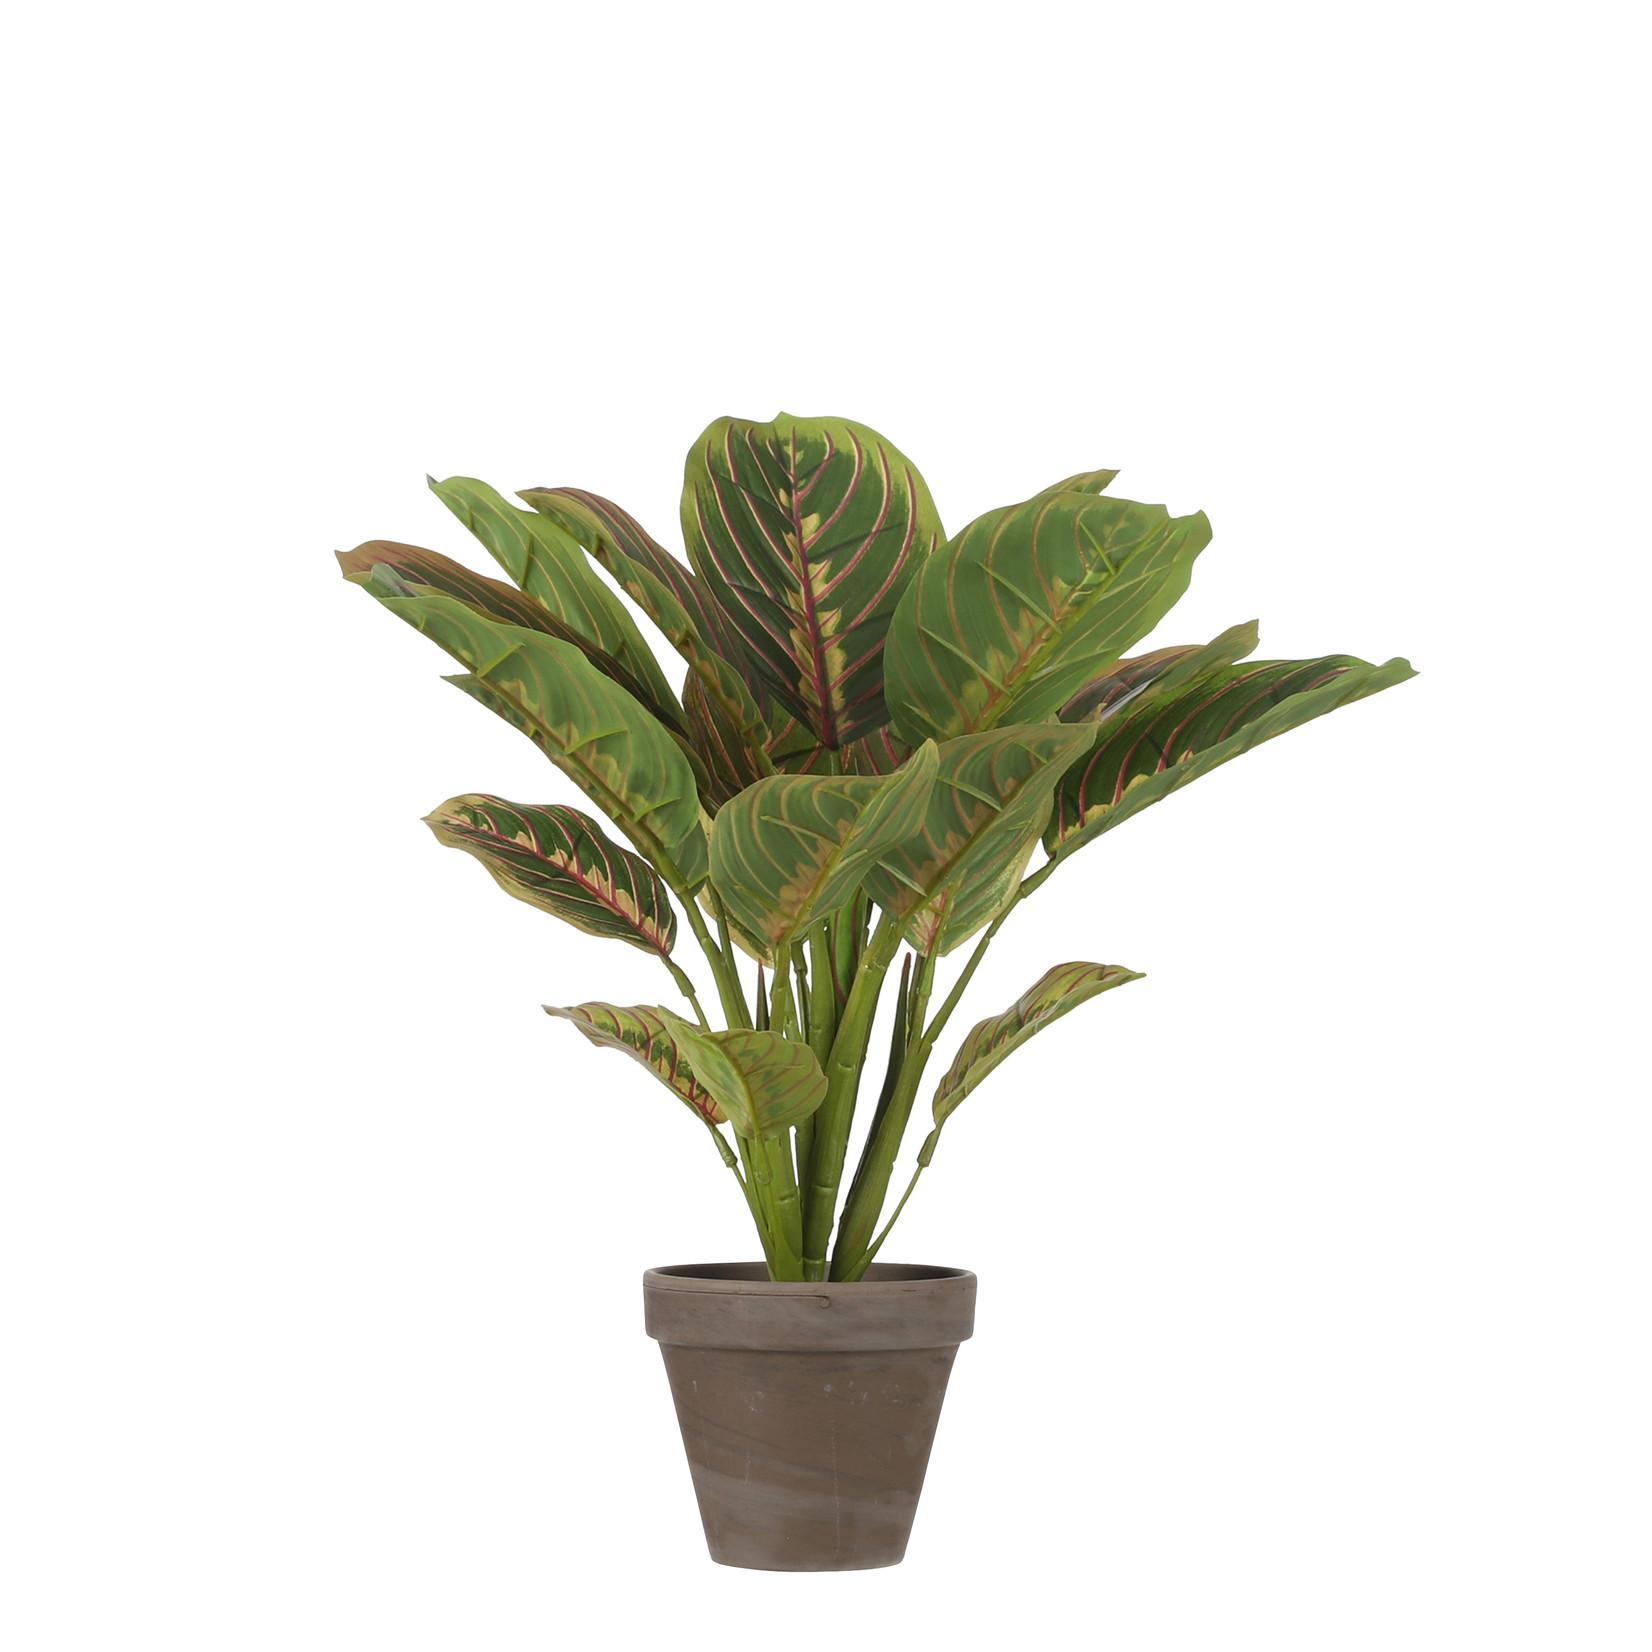 MiCa Calathea d.groen in pot Stan grey d11,5cm